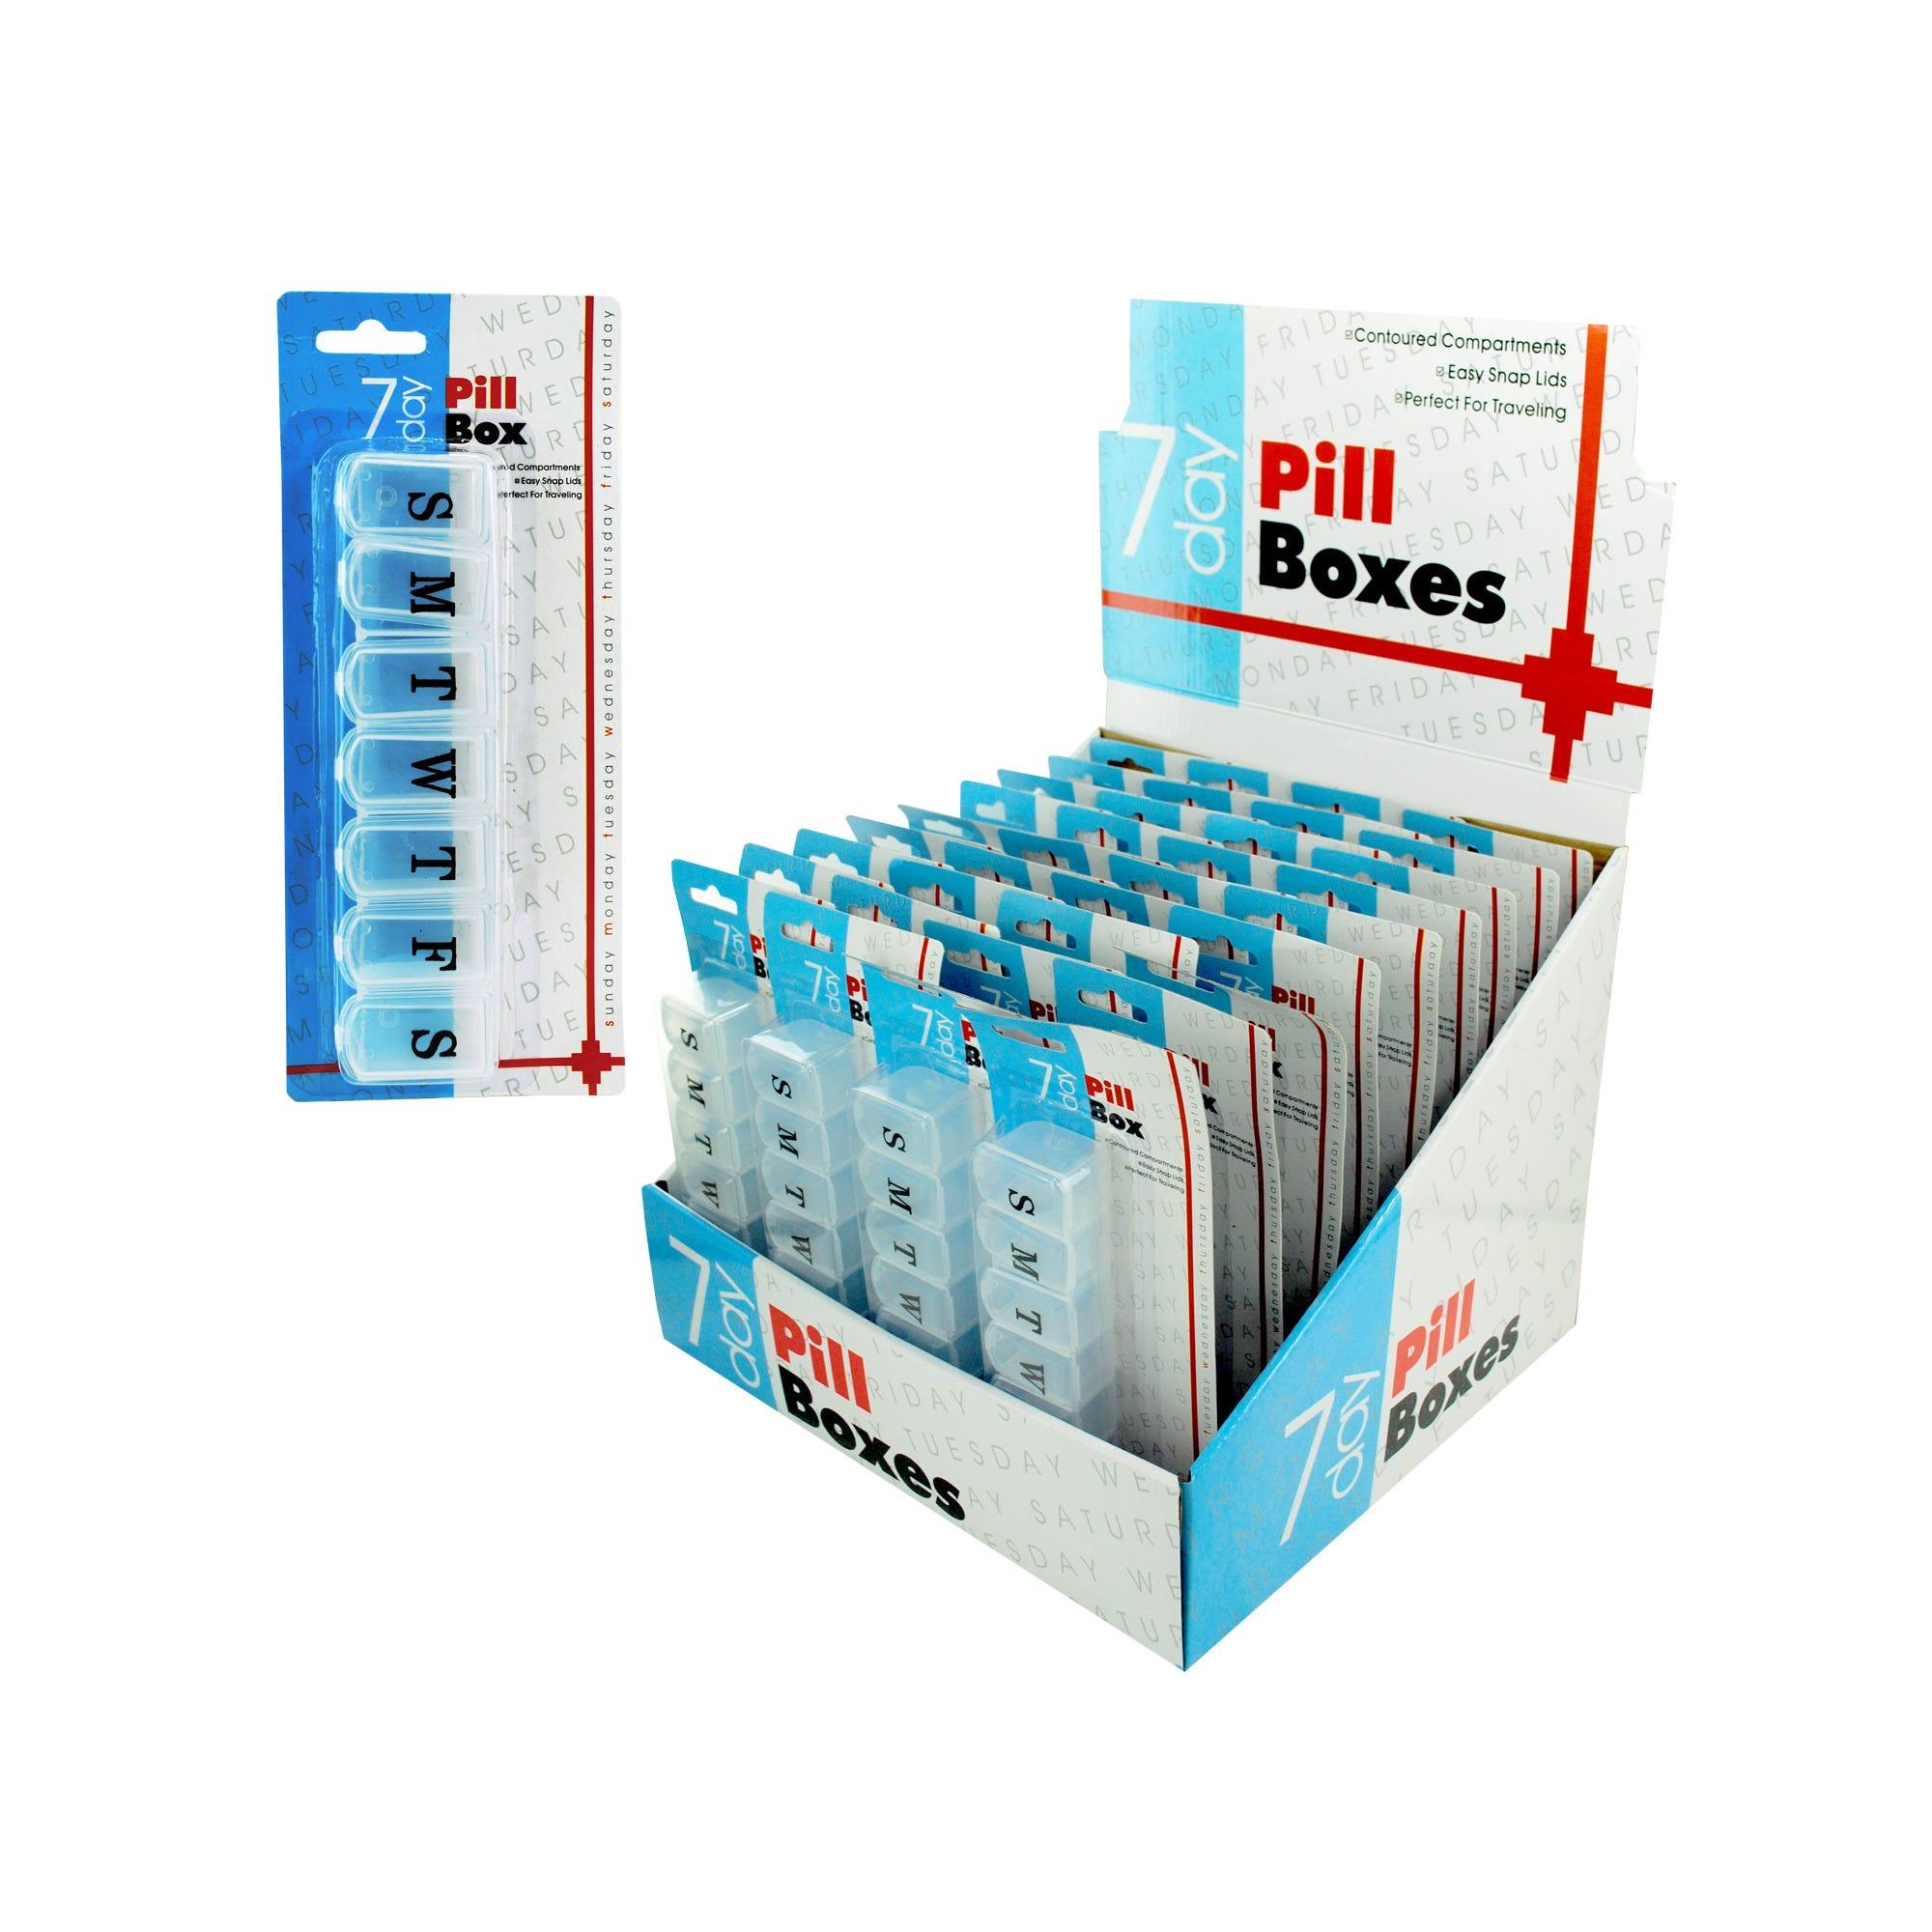 7-day-pill-box-countertop-display